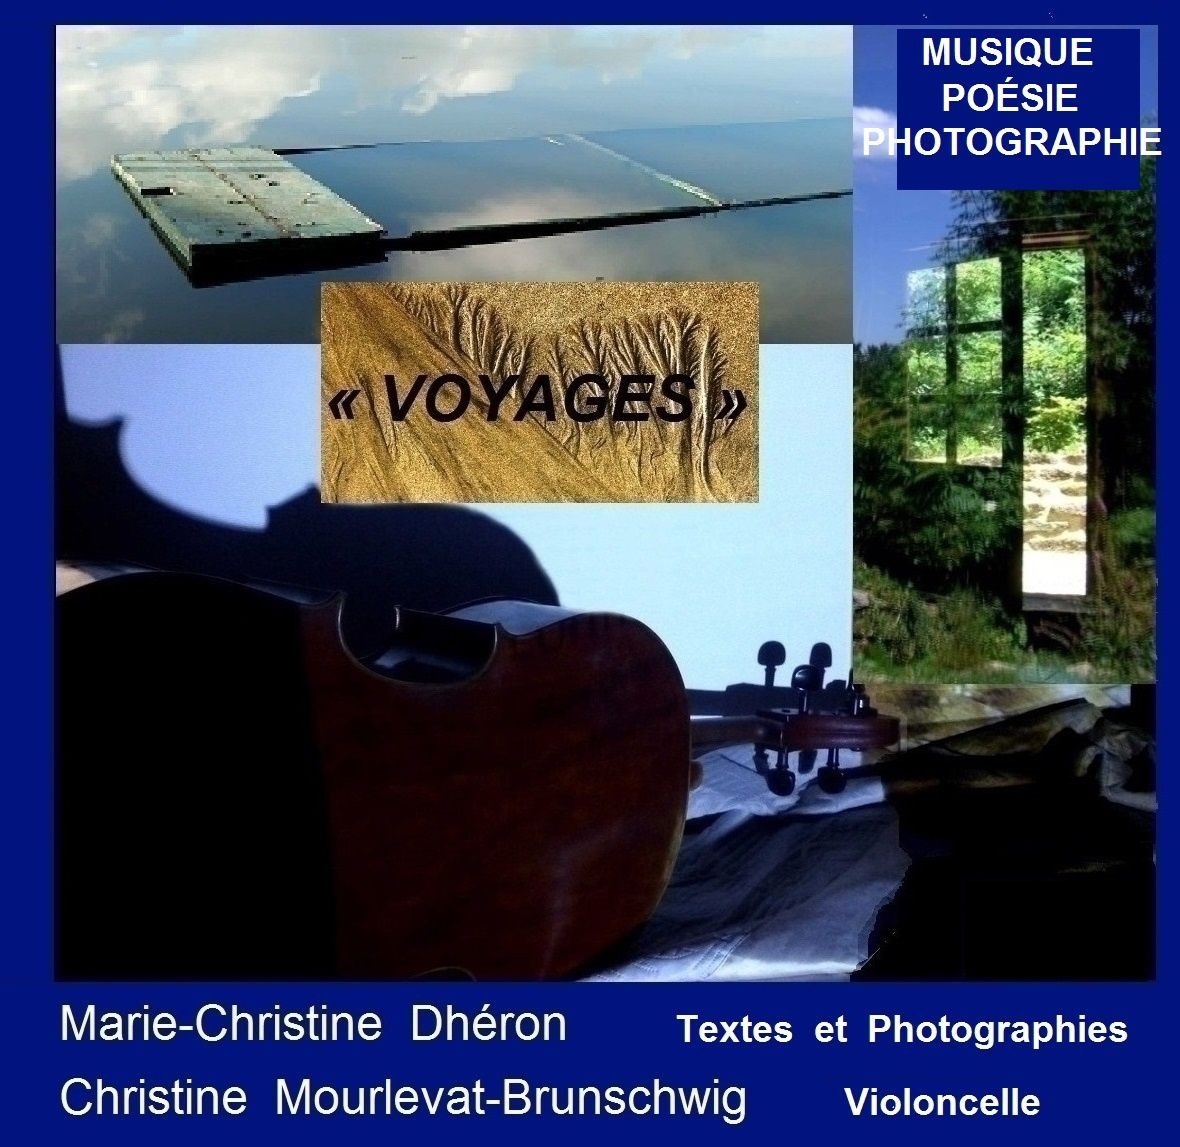 Spectacles, Marie-Christine Dhéron, textes / Christine Mourlevat-Brunschwig, violoncelle